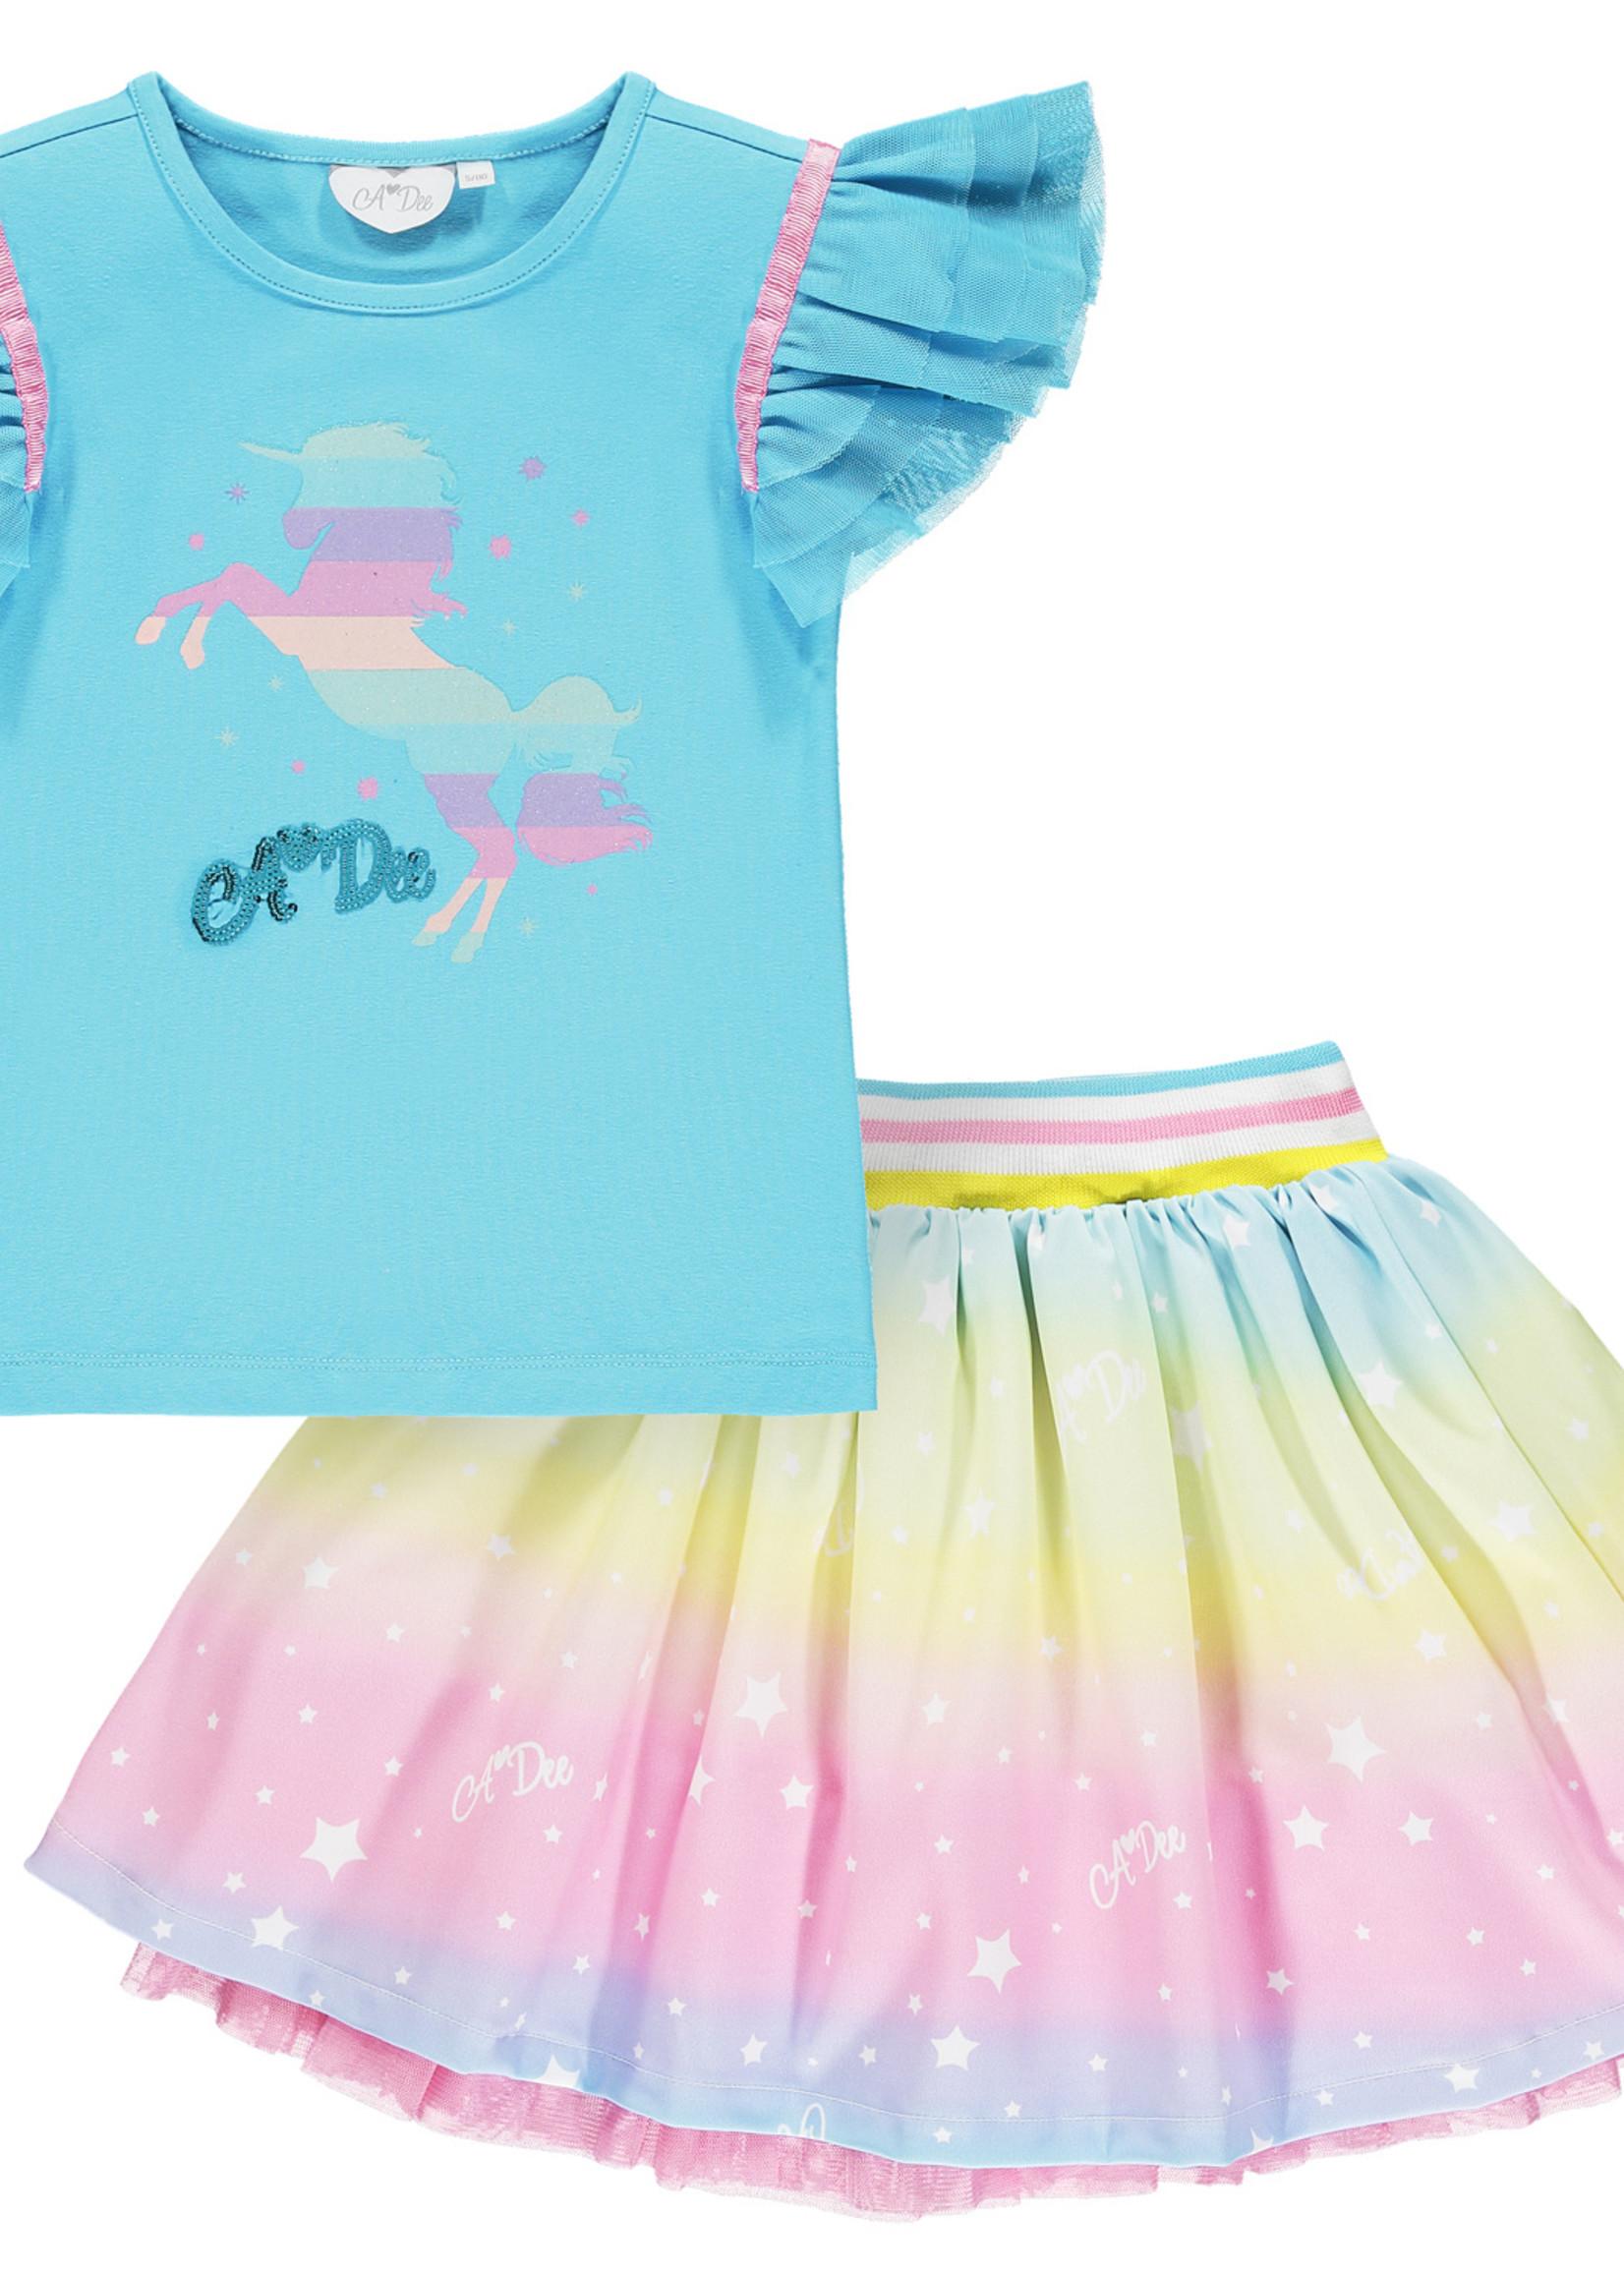 A Dee Nicky blue Rainbow unicorn t shirt